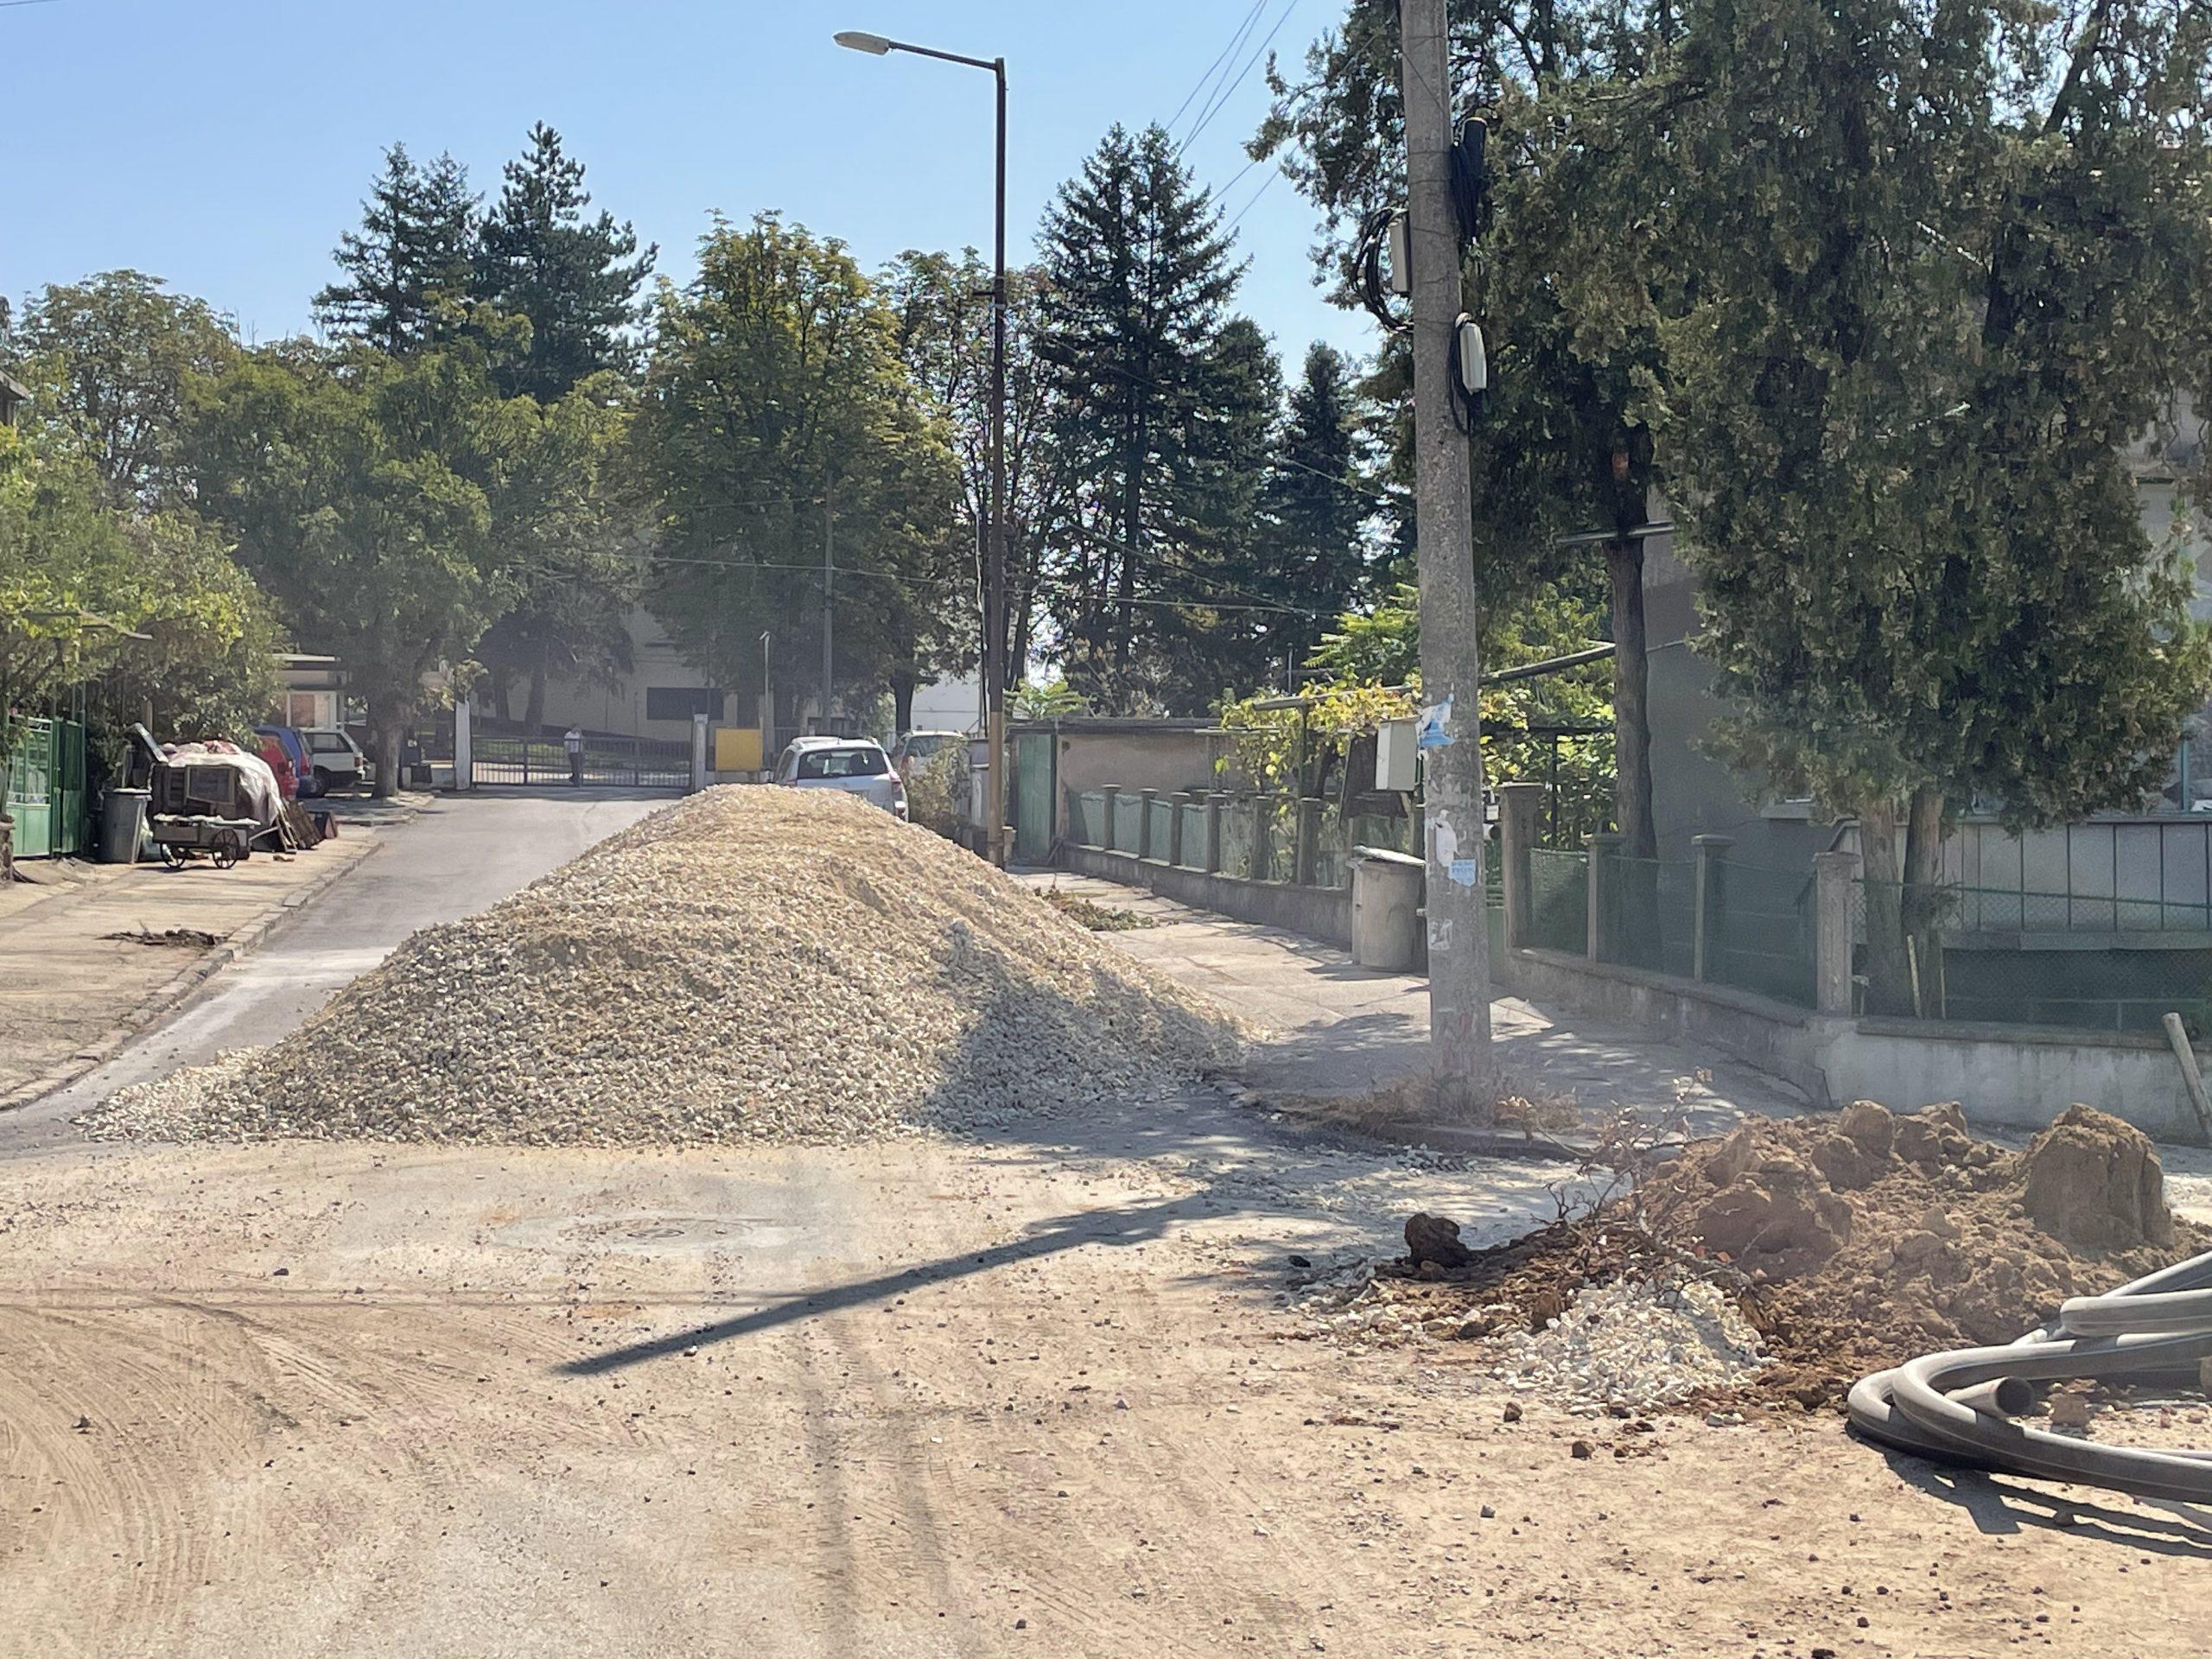 ВиК Червен бряг нерегламентирано затвориха входа на частна фирма